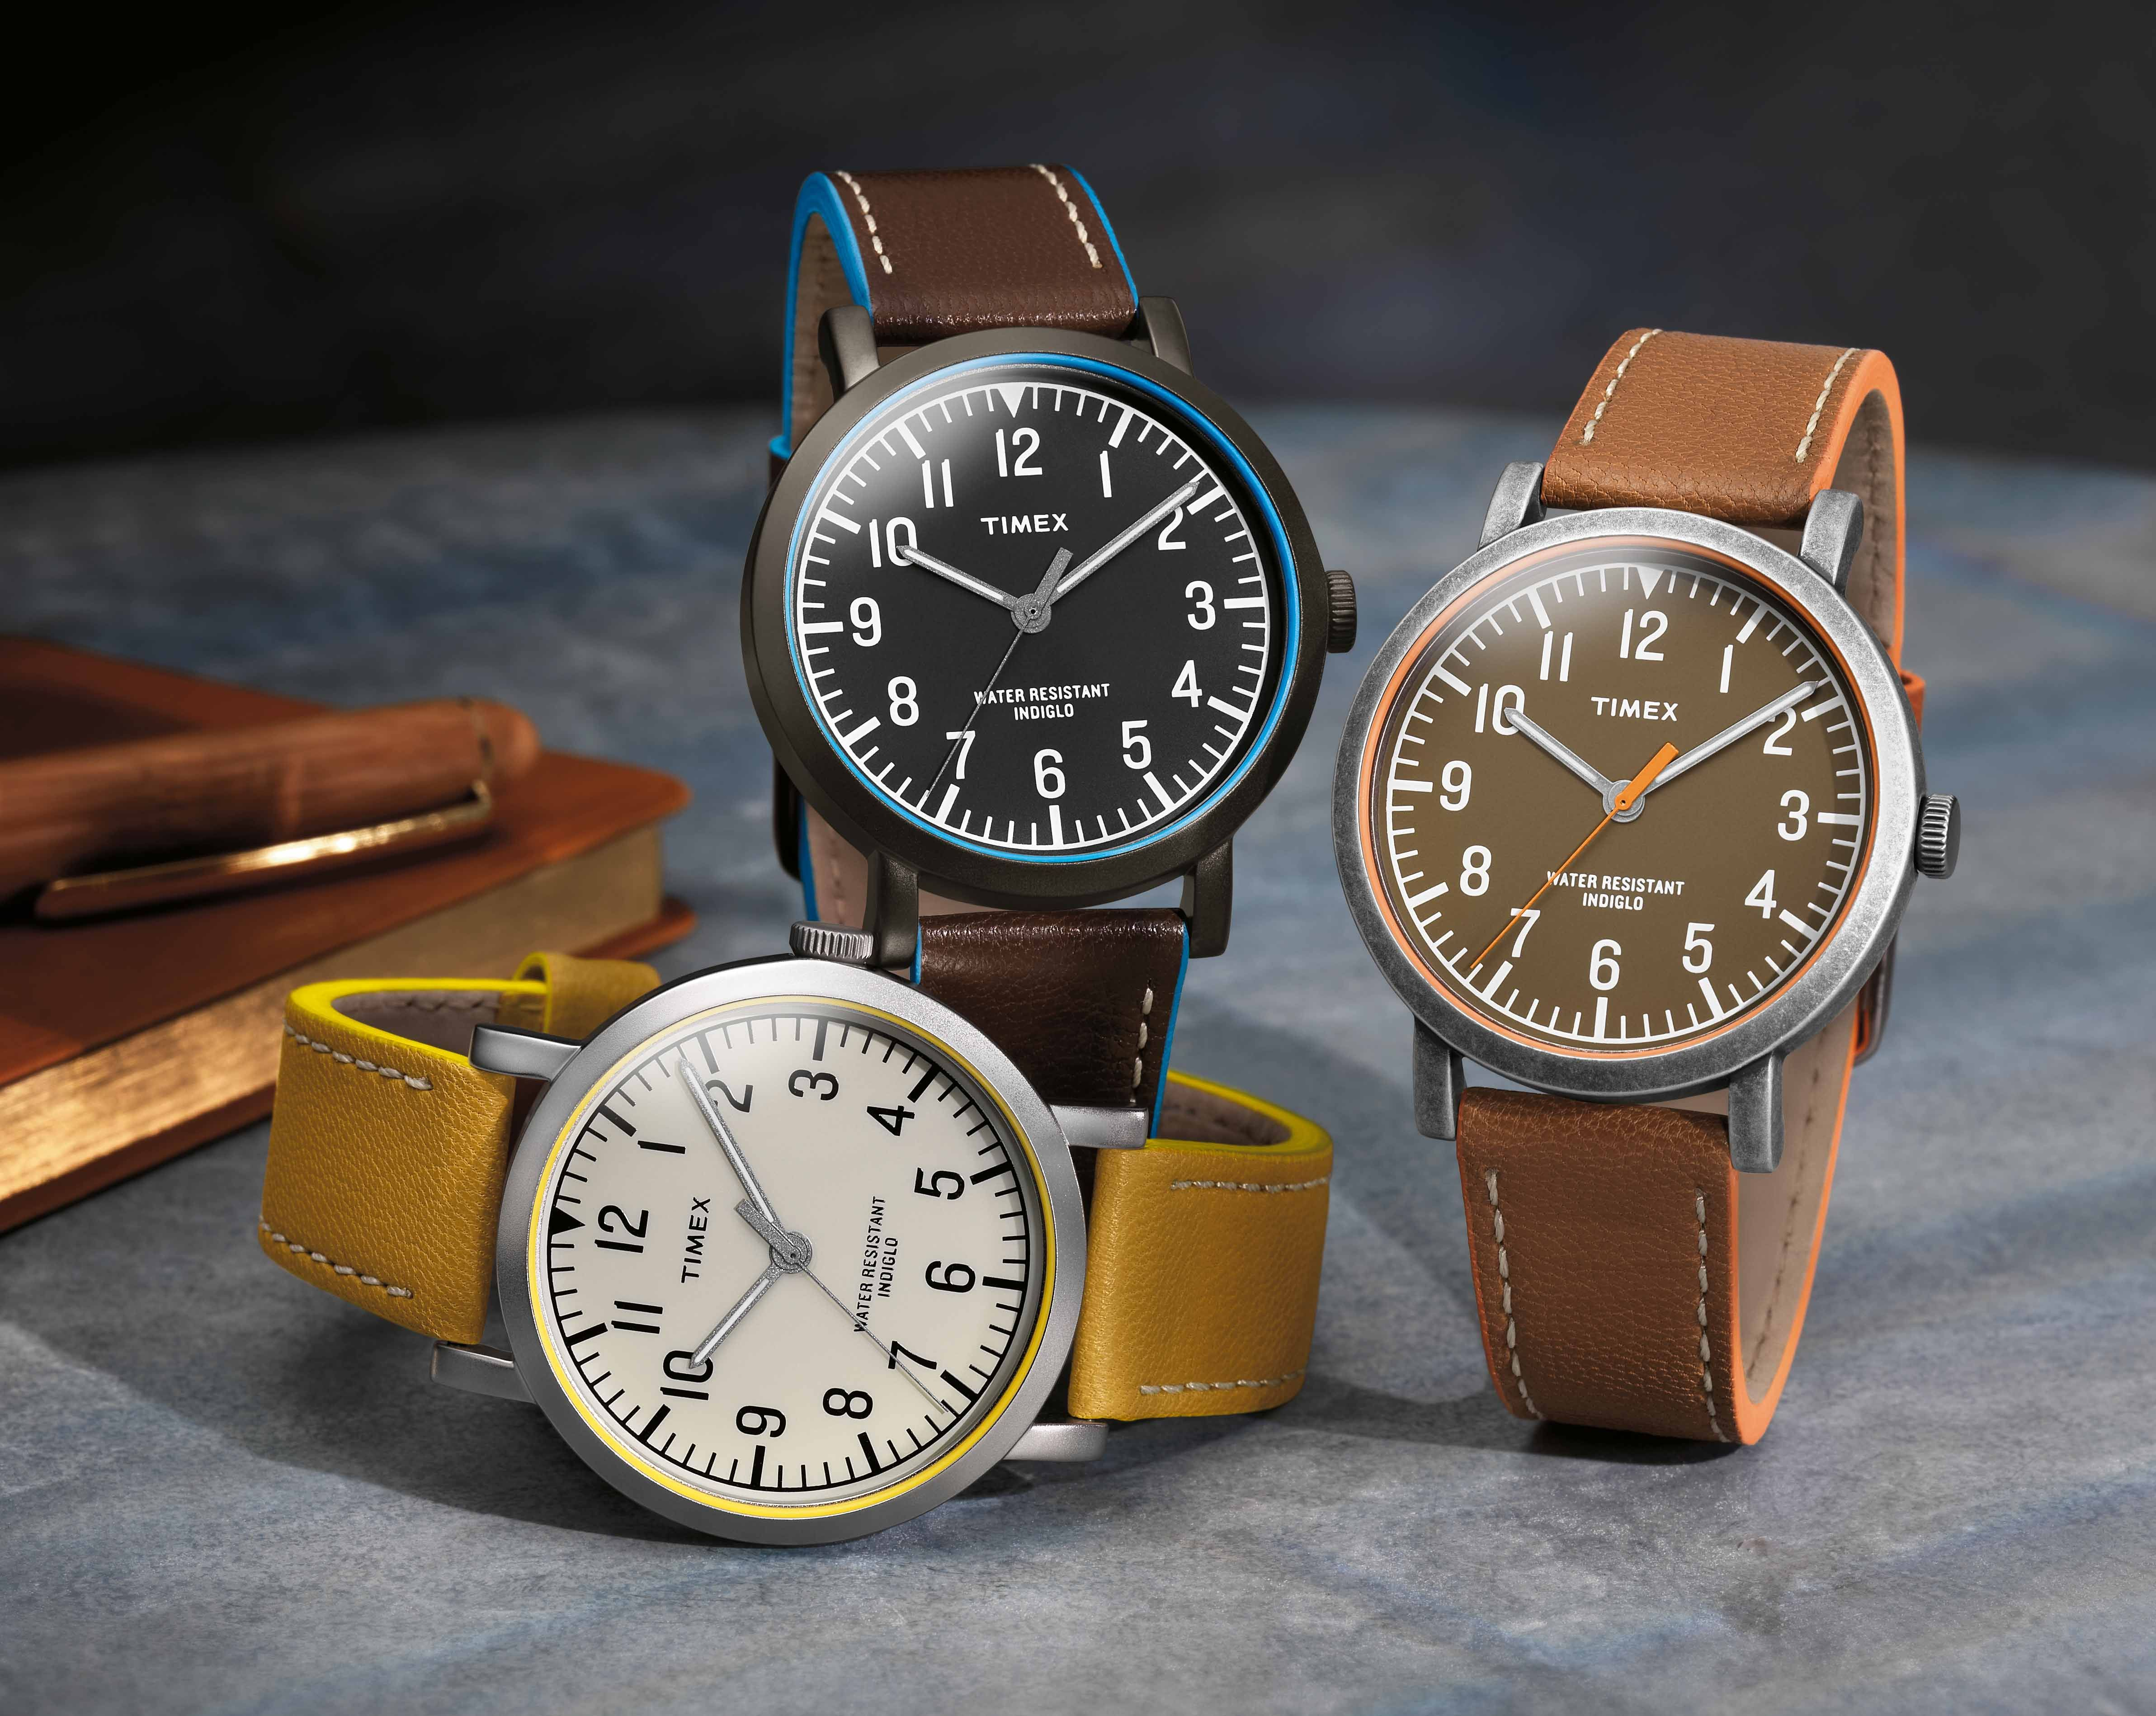 Originals Classic Round Pop T2p505t2p506t2p507 Resized Watches Fossil Me3130